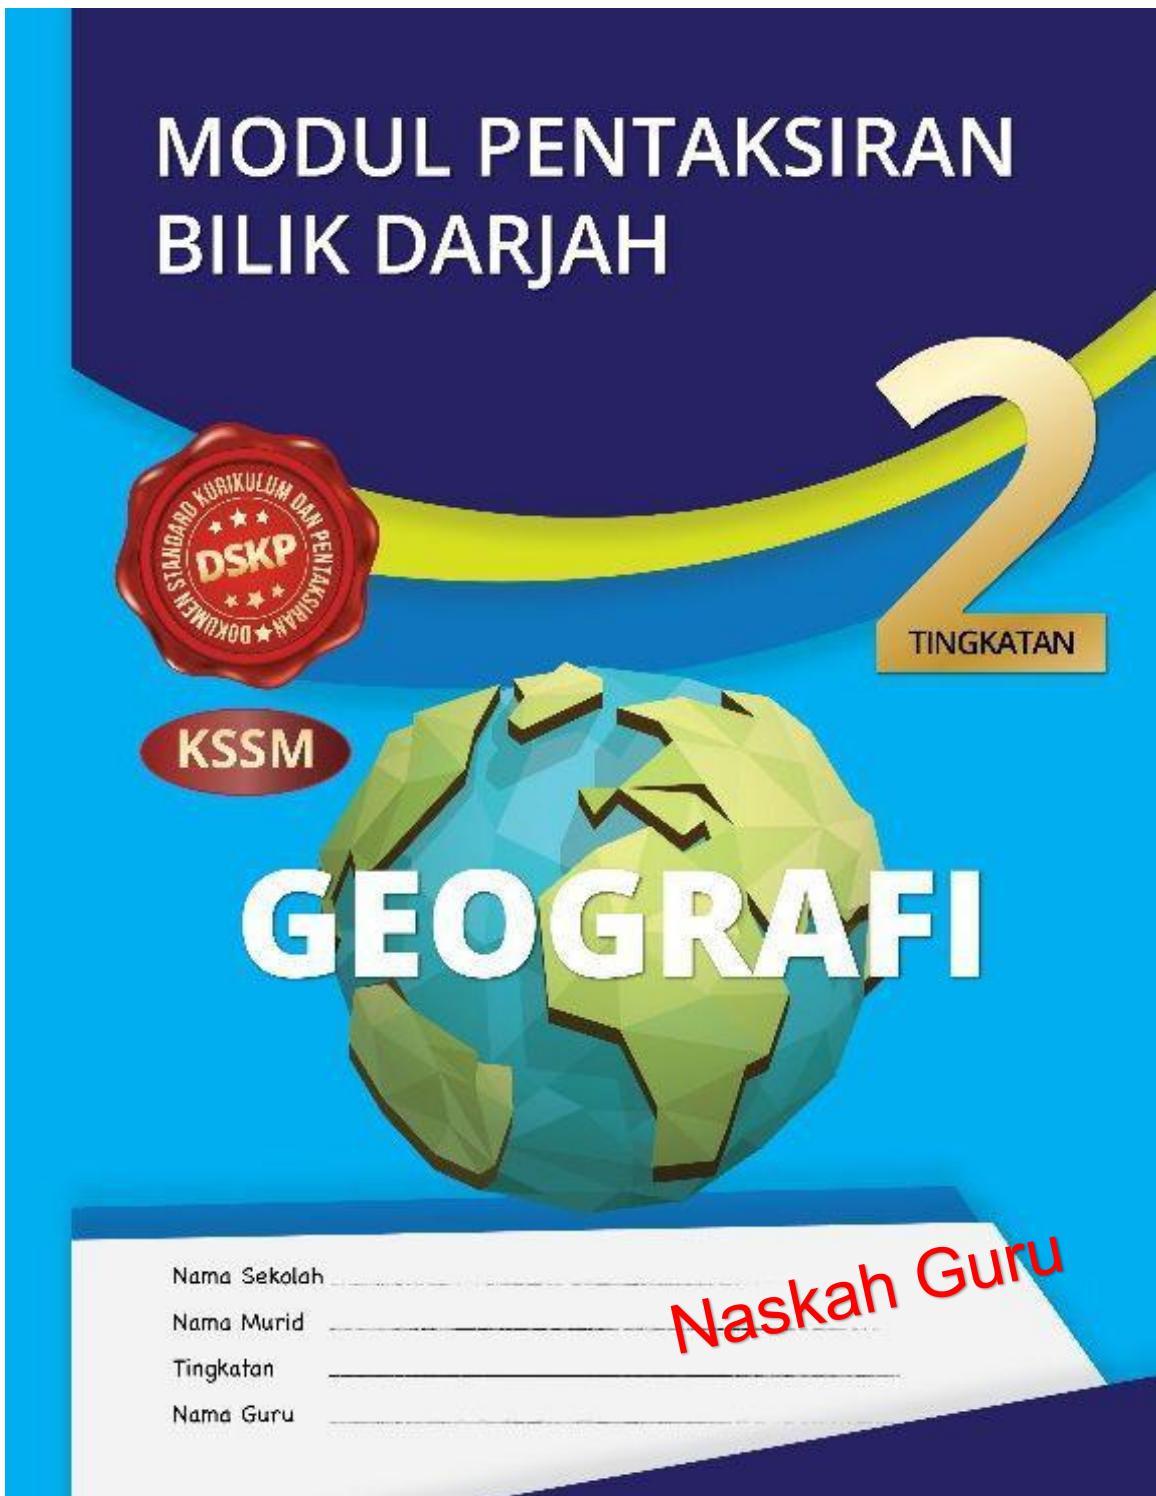 Jawapan Modul Pbd Geografi Tingkatan 2 By Rosdidaud74 Issuu